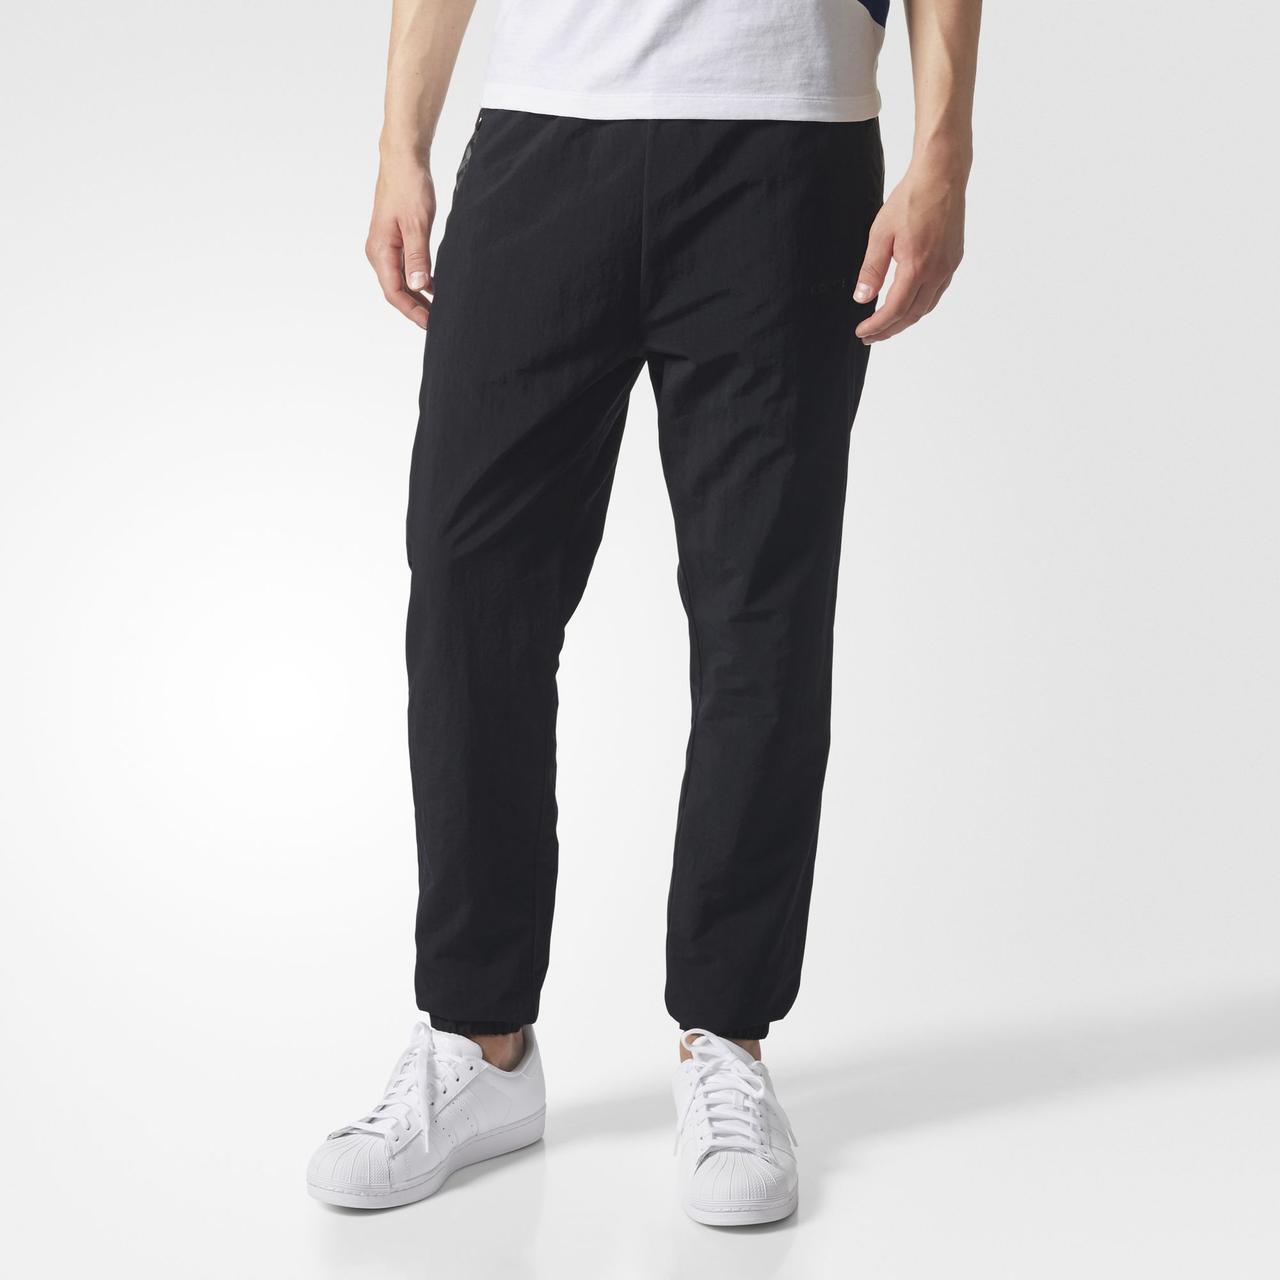 Мужские брюки Adidas Originals Tribe (Артикул: BS2217)